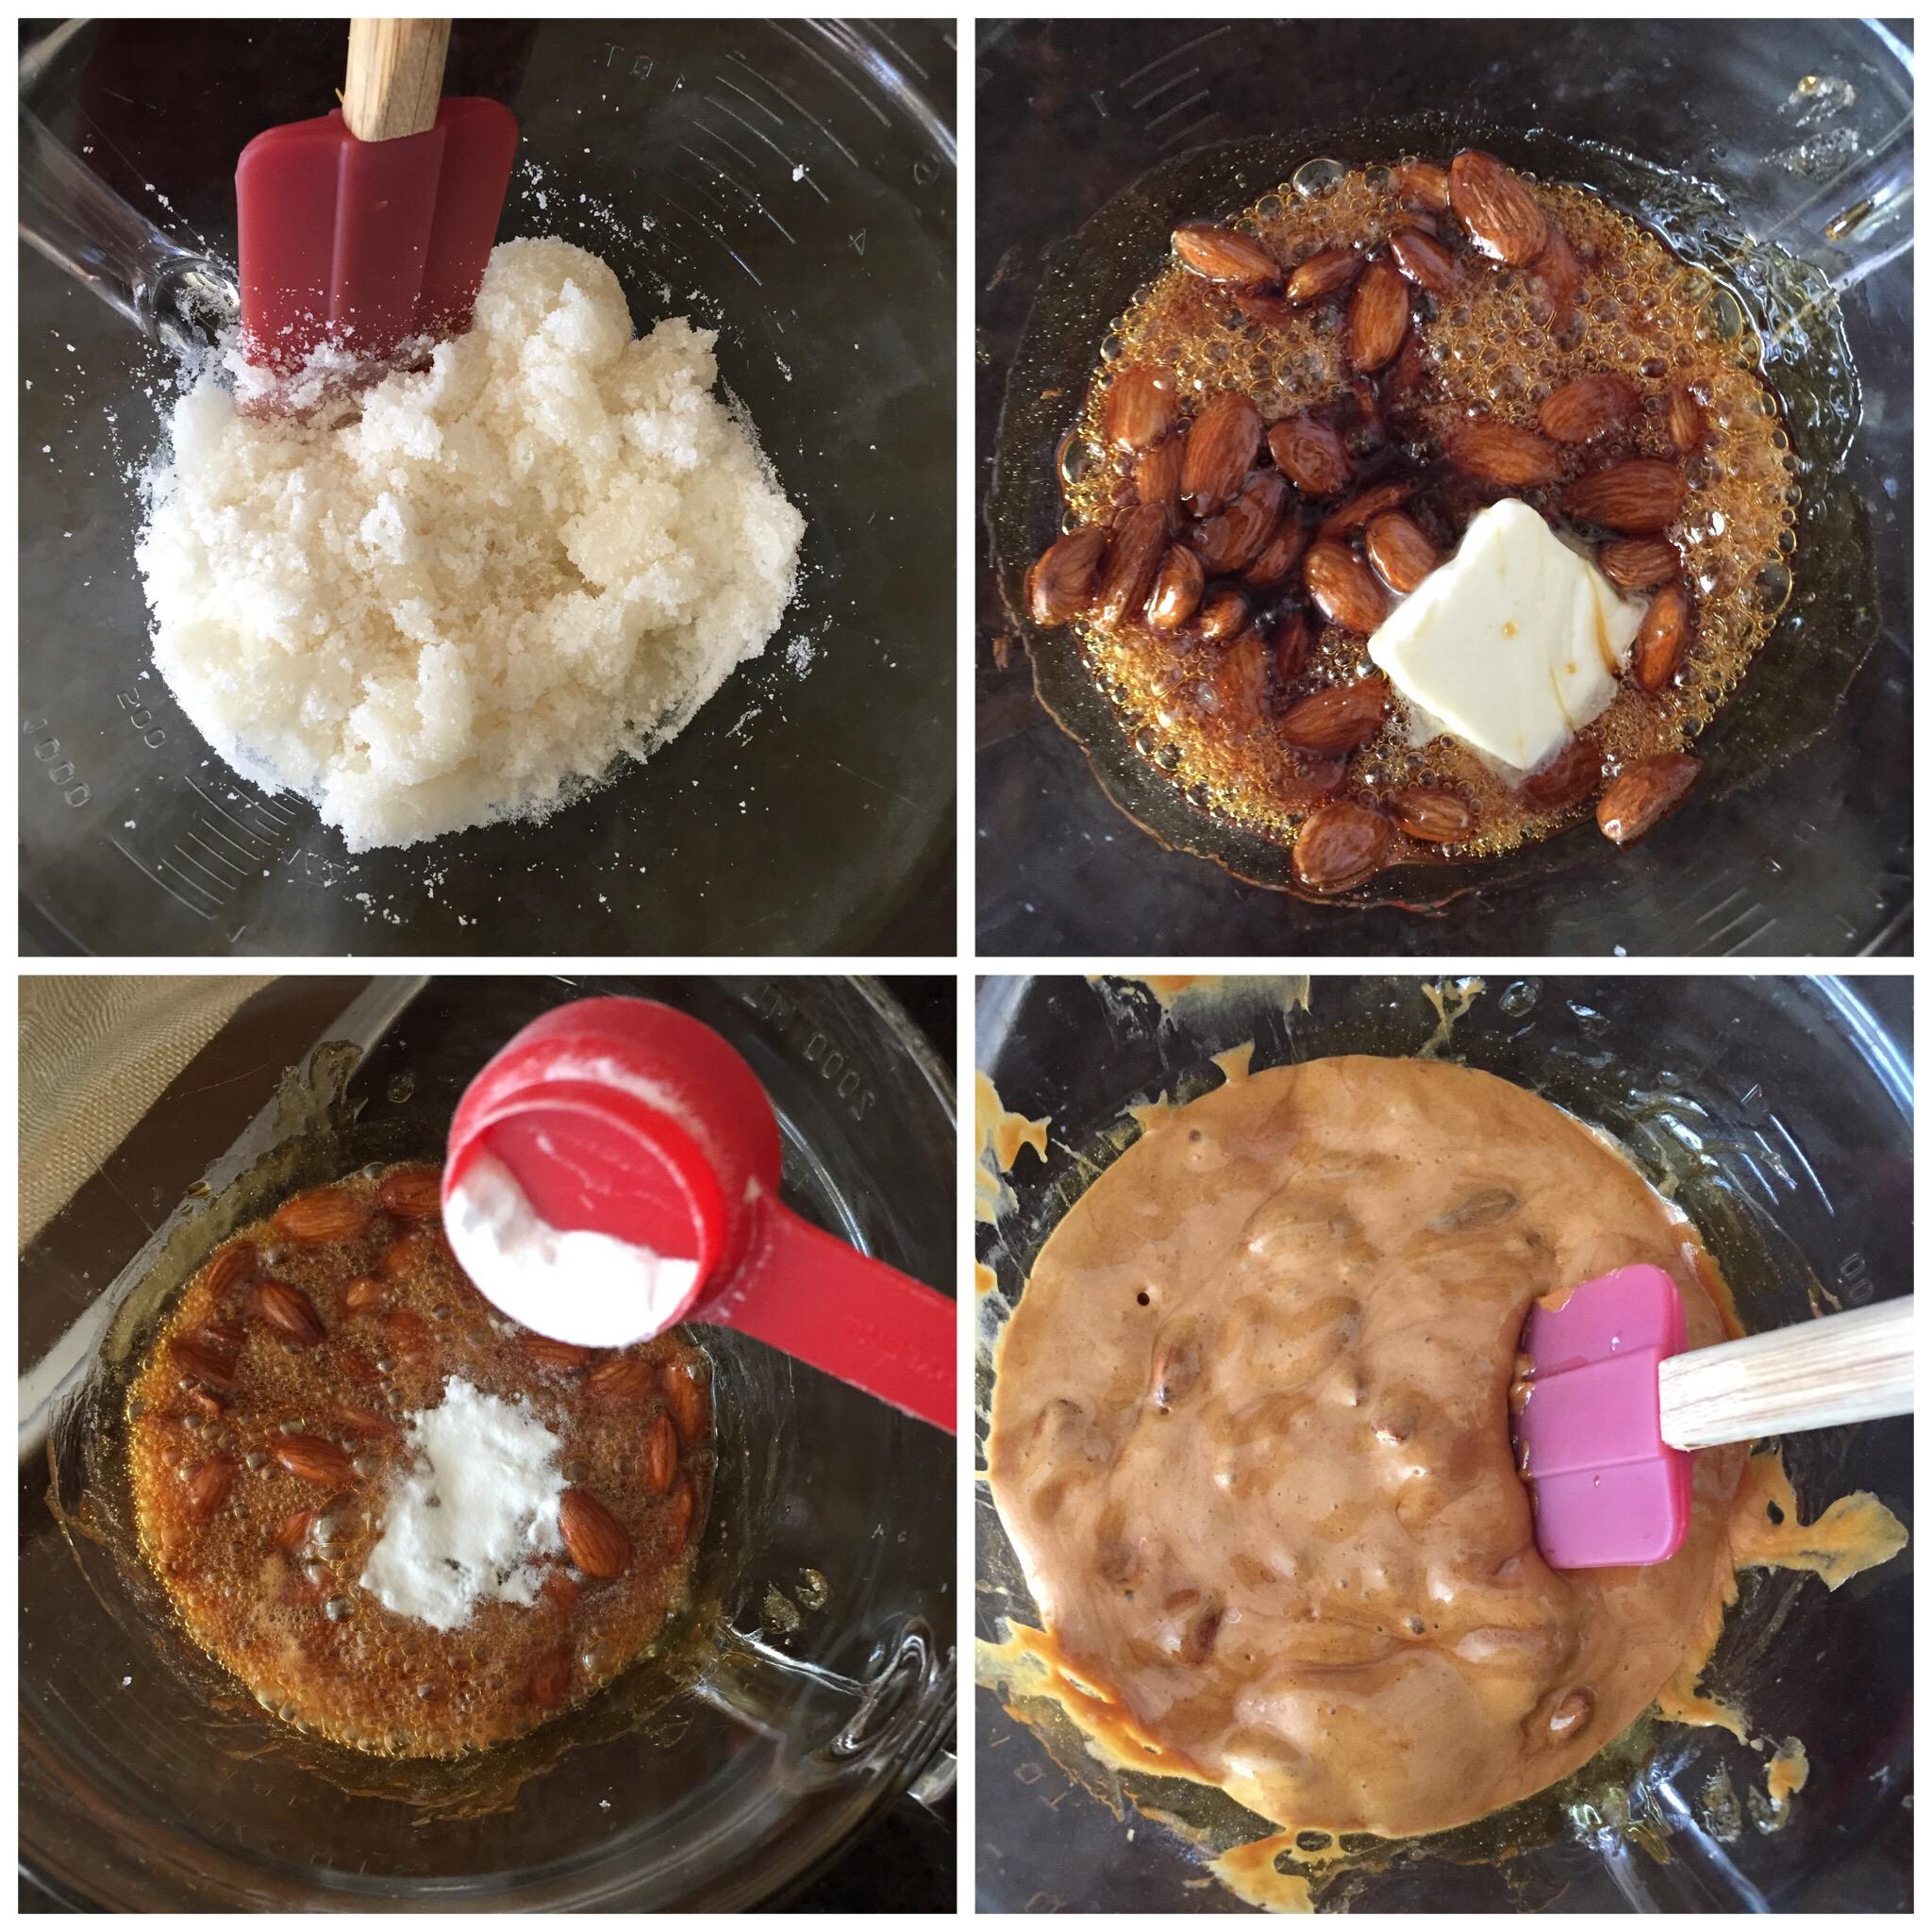 Easy microwave Almond Brittle- www.ChefShayna.com